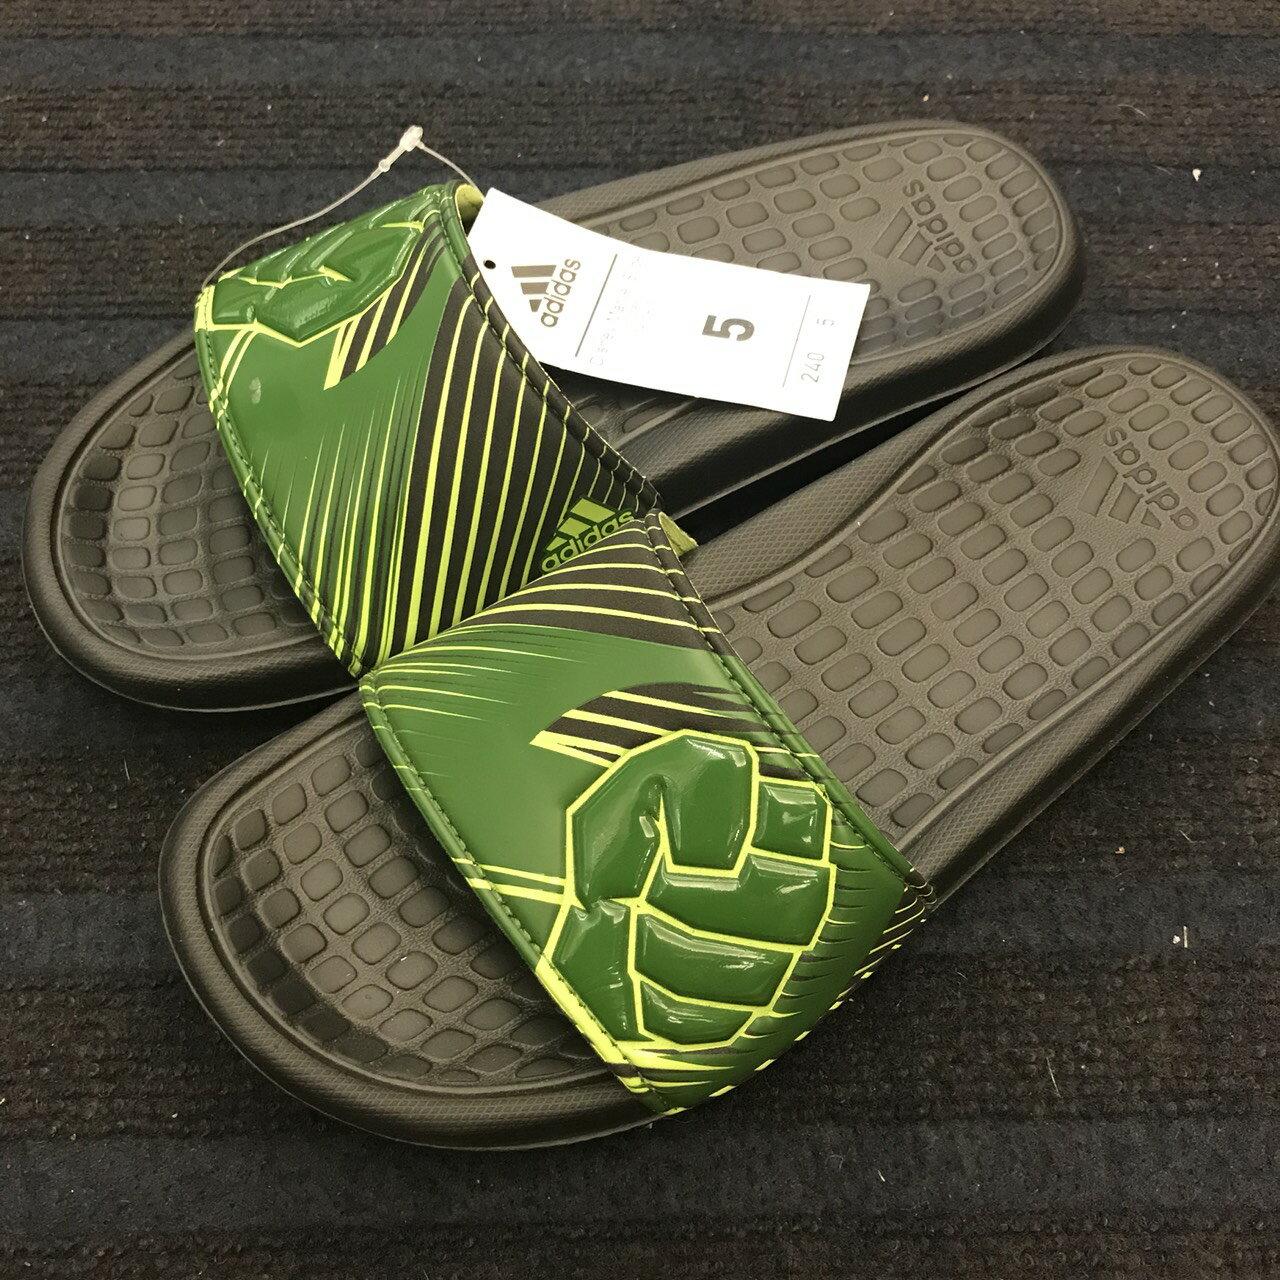 BEETLE ADIDAS MARVEL 愛迪達 綠巨人 浩克 拖鞋 AQ5119 黑綠